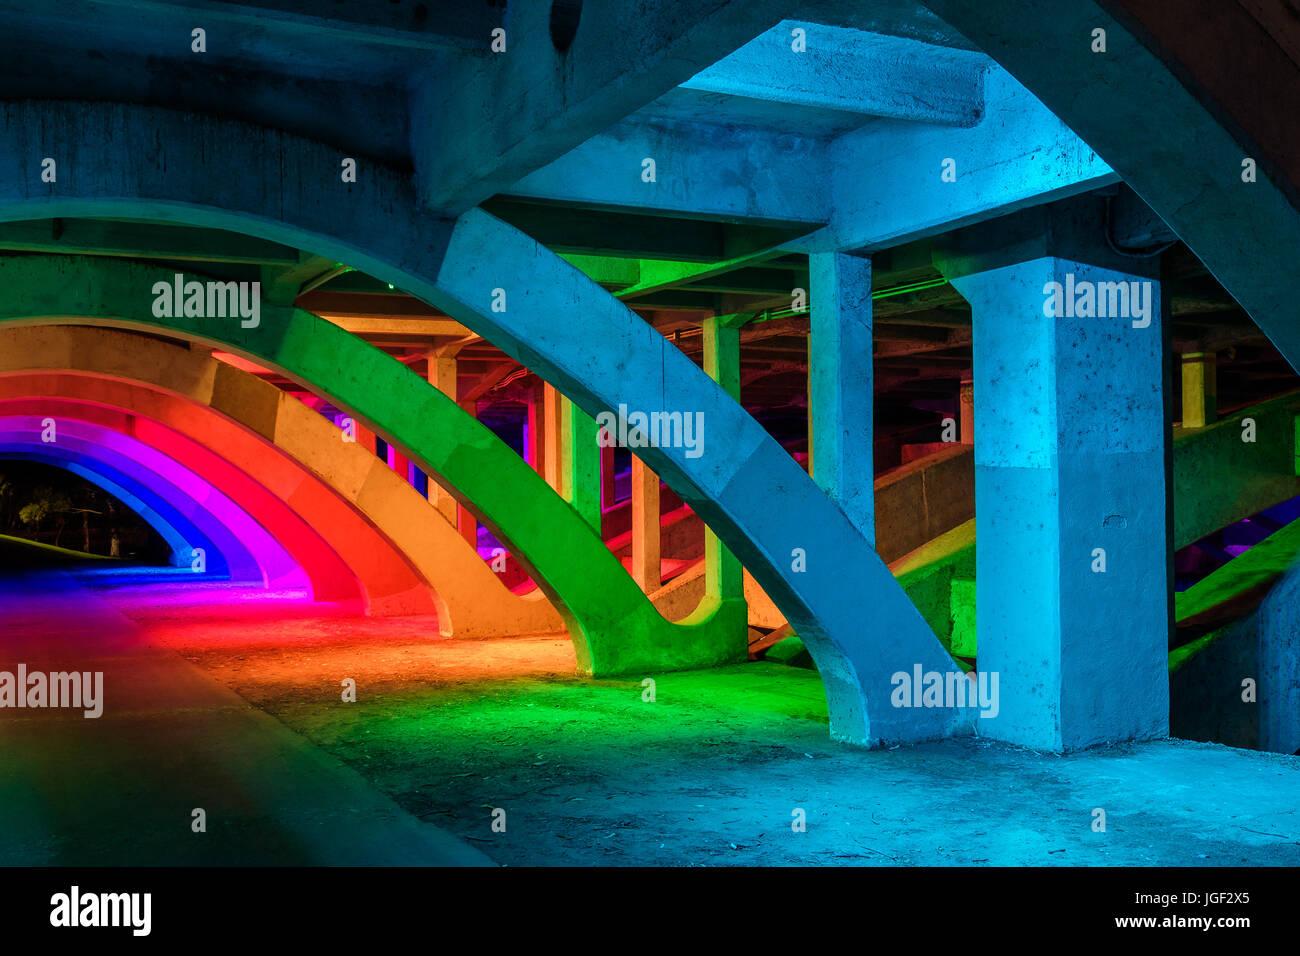 King William Brücke Unterführung Beleuchtung in Adelaide city Stockbild